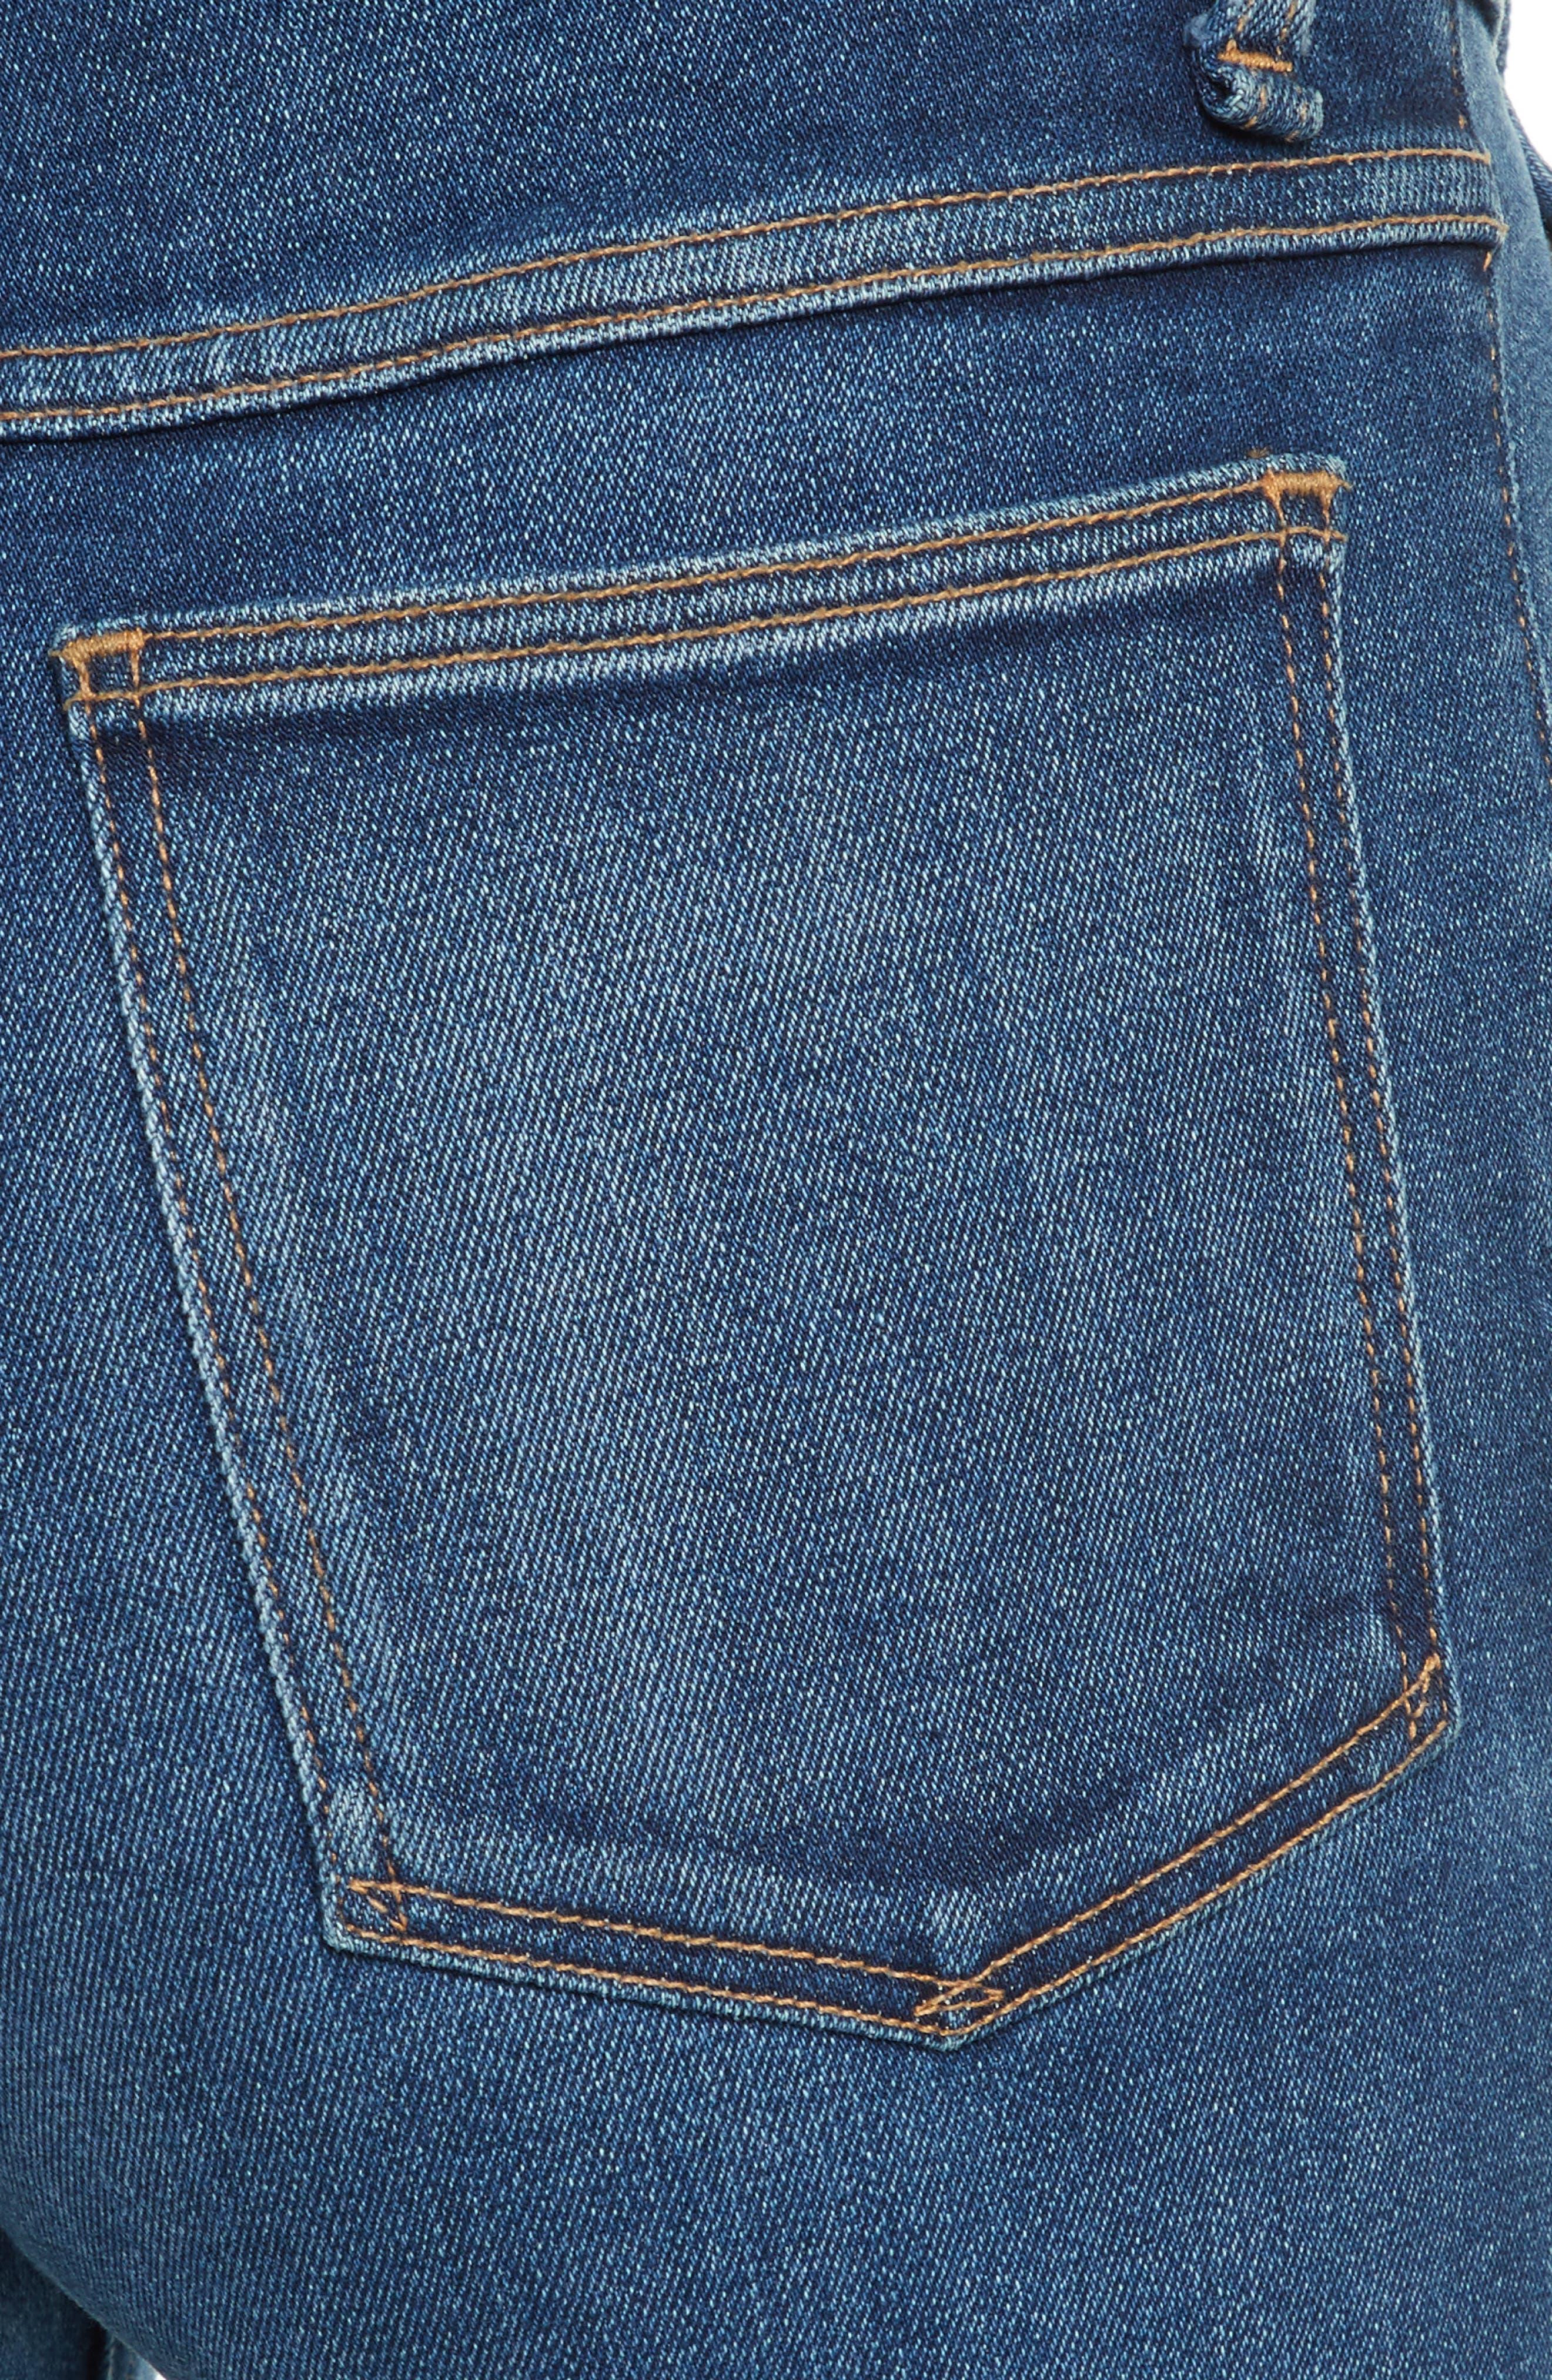 Justine High Waist Trouser Jeans,                             Alternate thumbnail 4, color,                             462